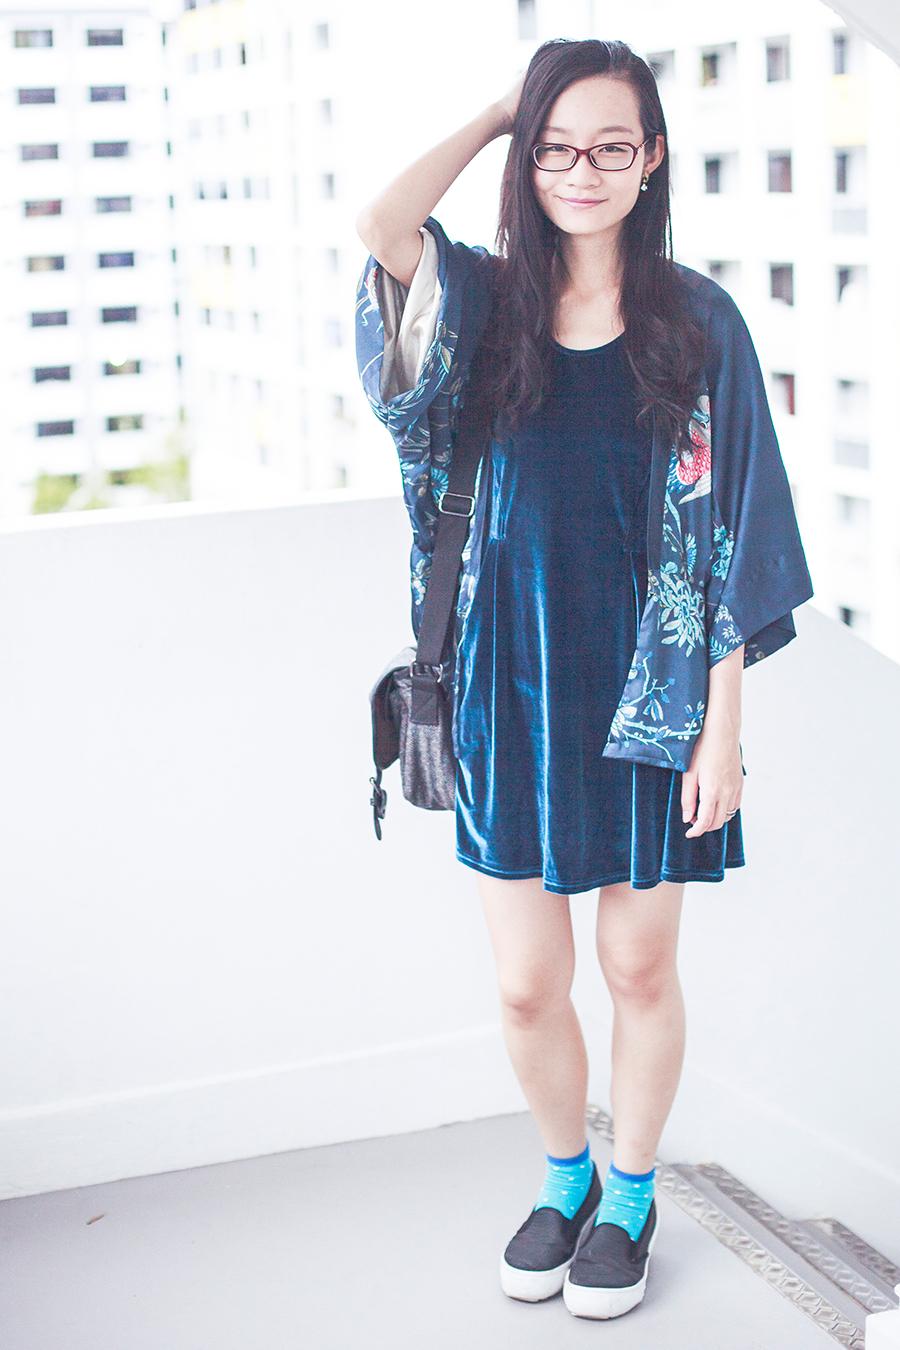 Dressin blue phoenix kimono cardigan, Cotton On velvet dress, Bugis Street grey satchel, Firmoo red prescription glasses online, Spurr Monique sneakers via Zalora.